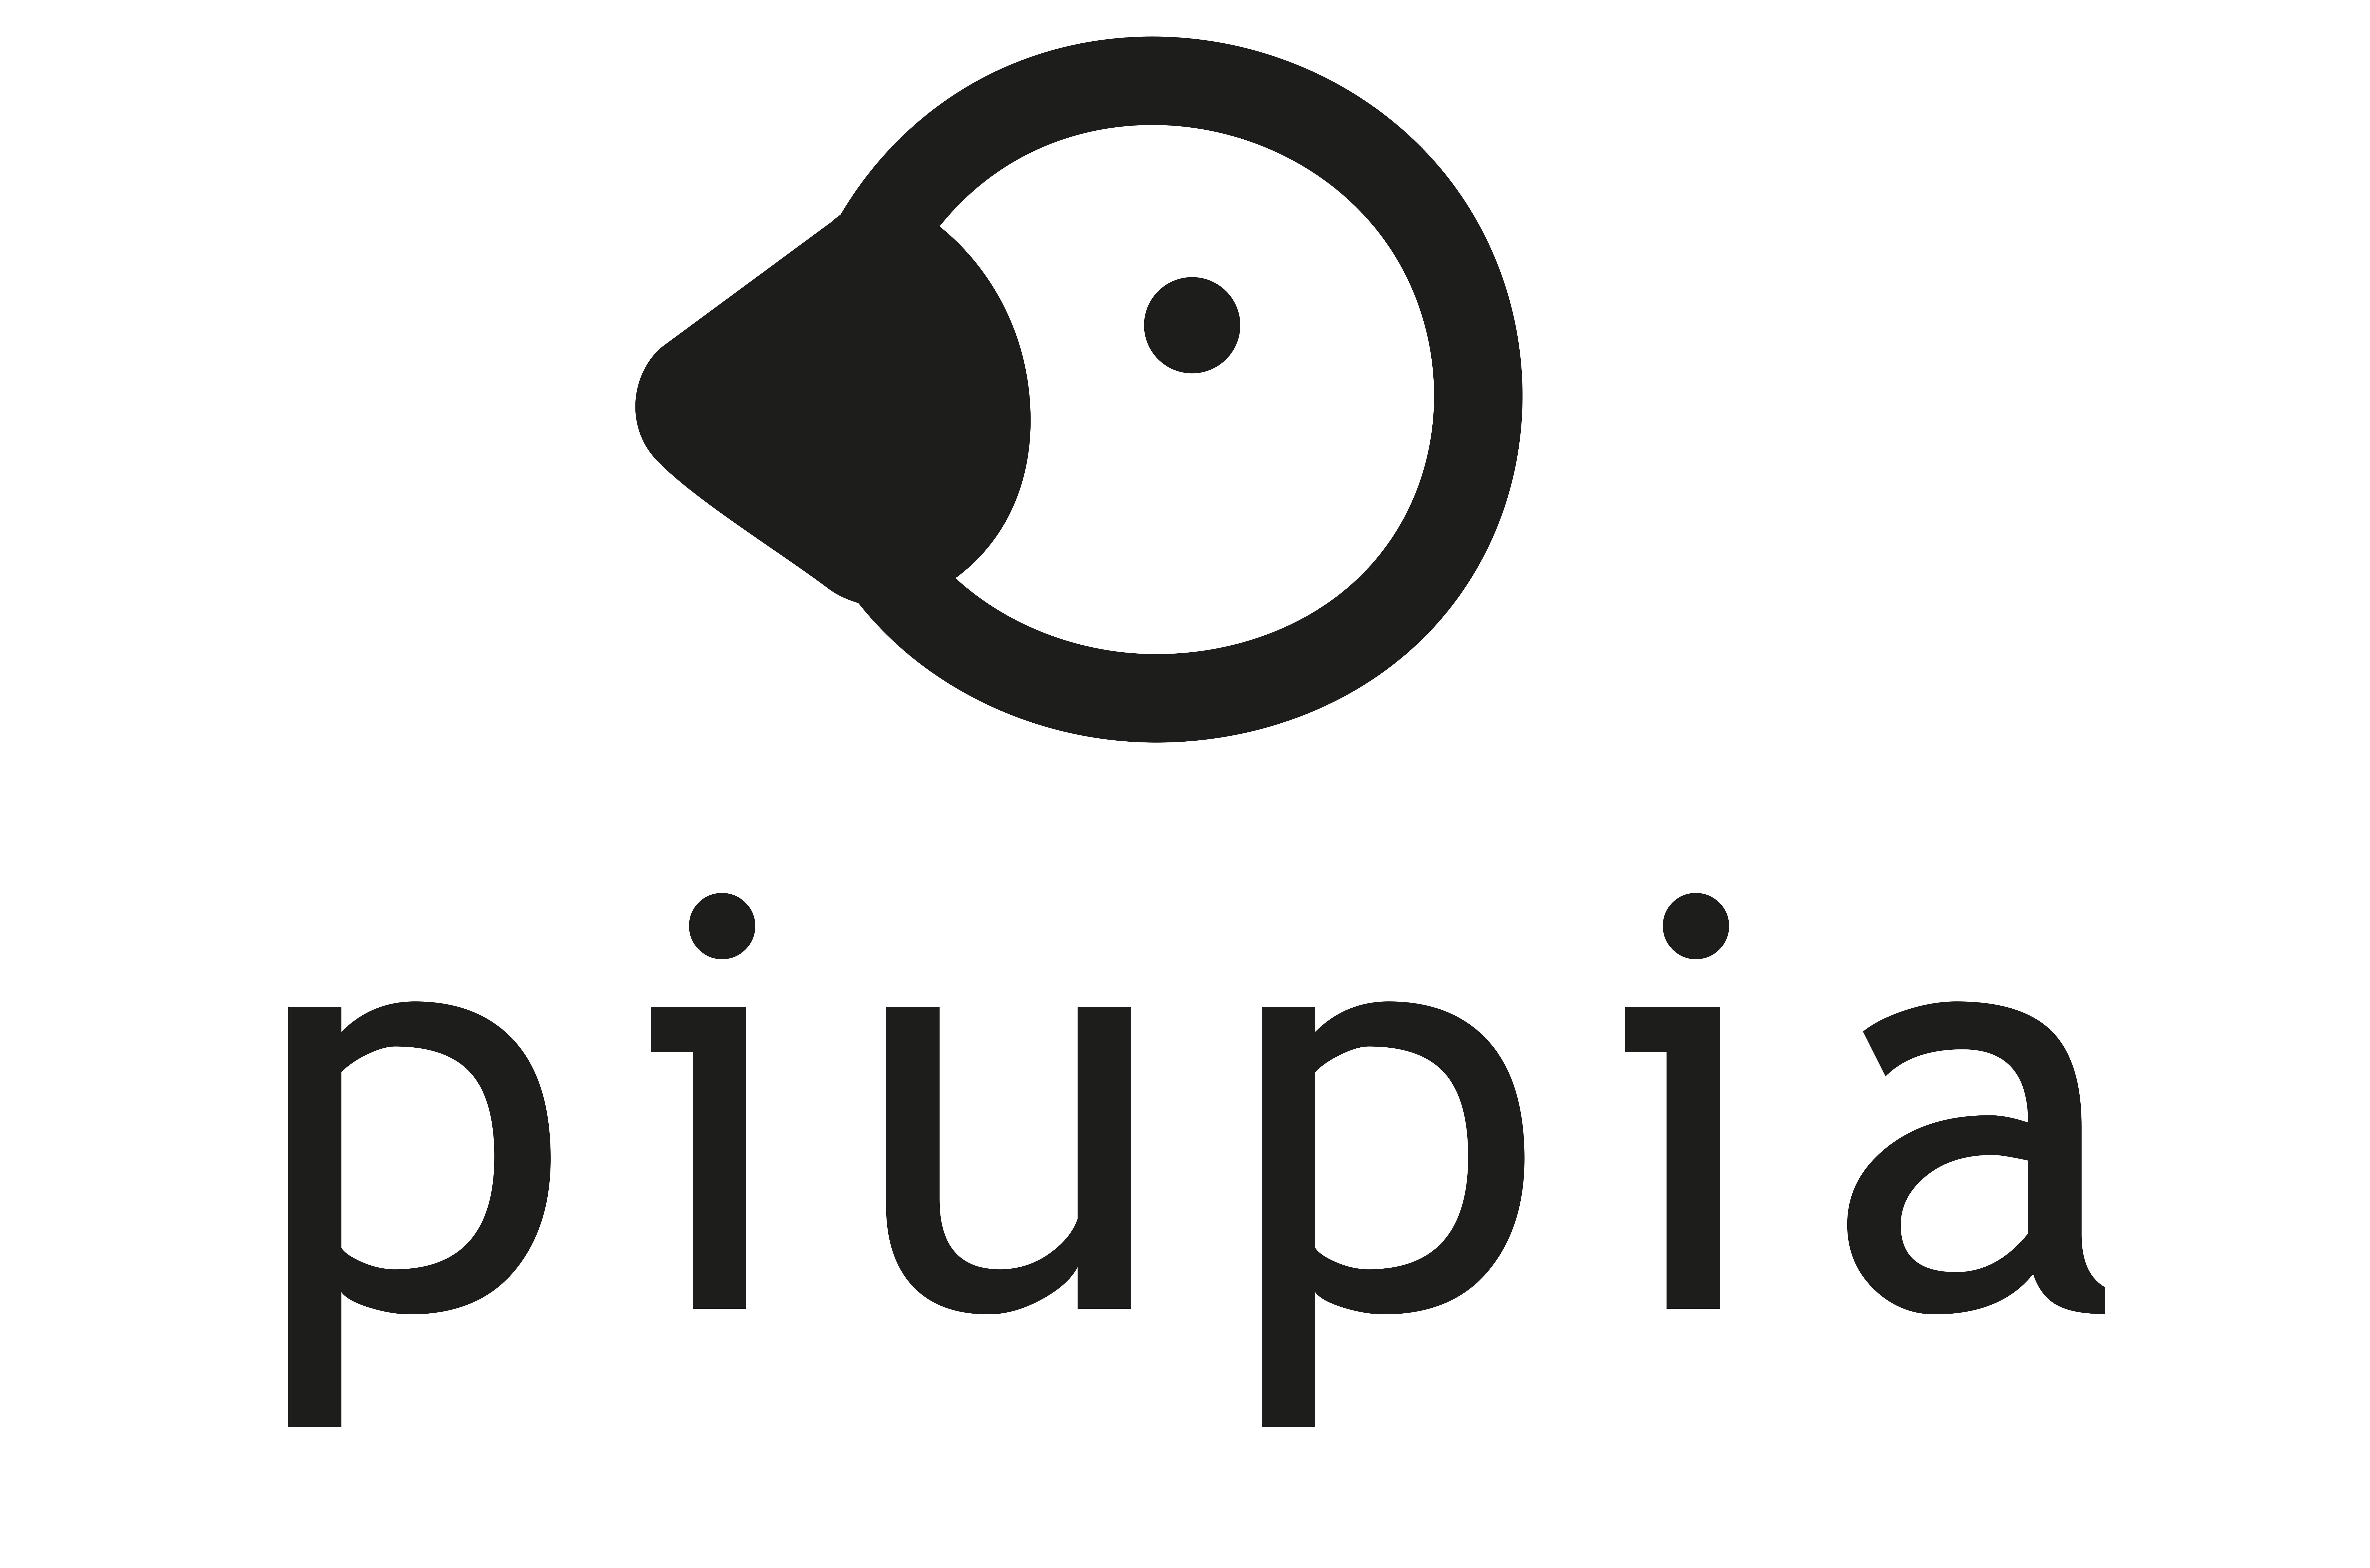 Piupia logo